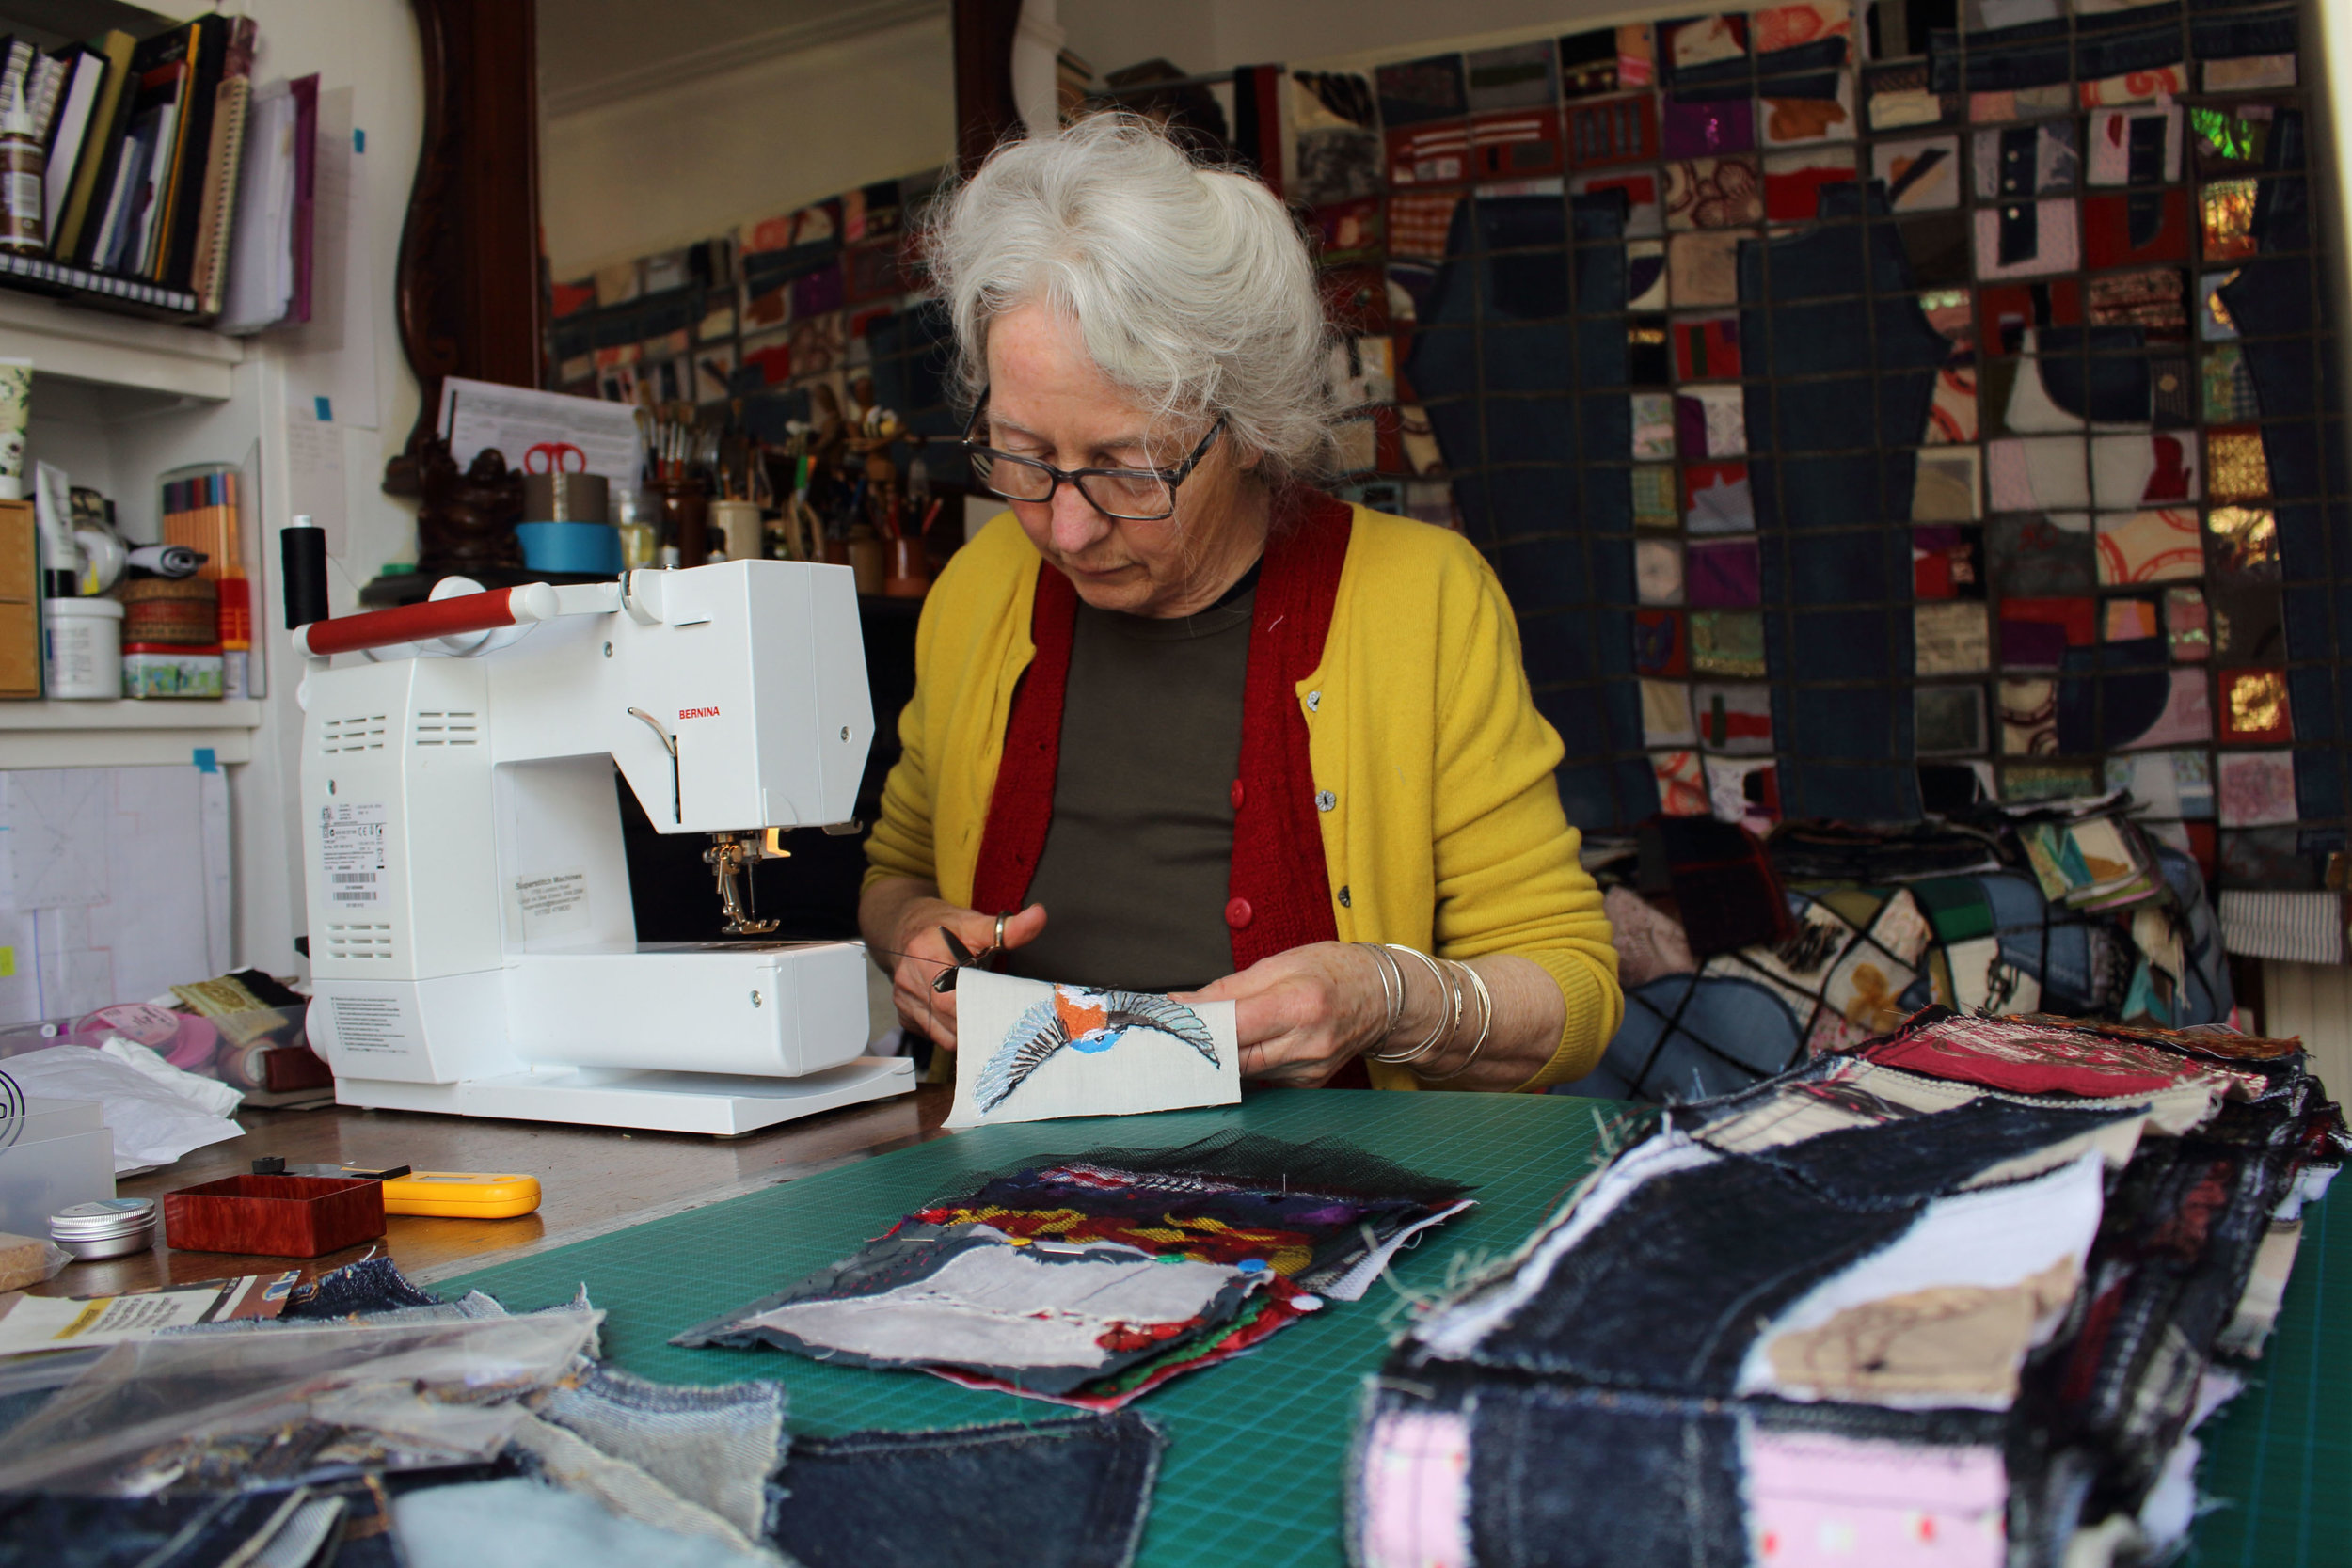 Sewing machine IMG_7470.jpg